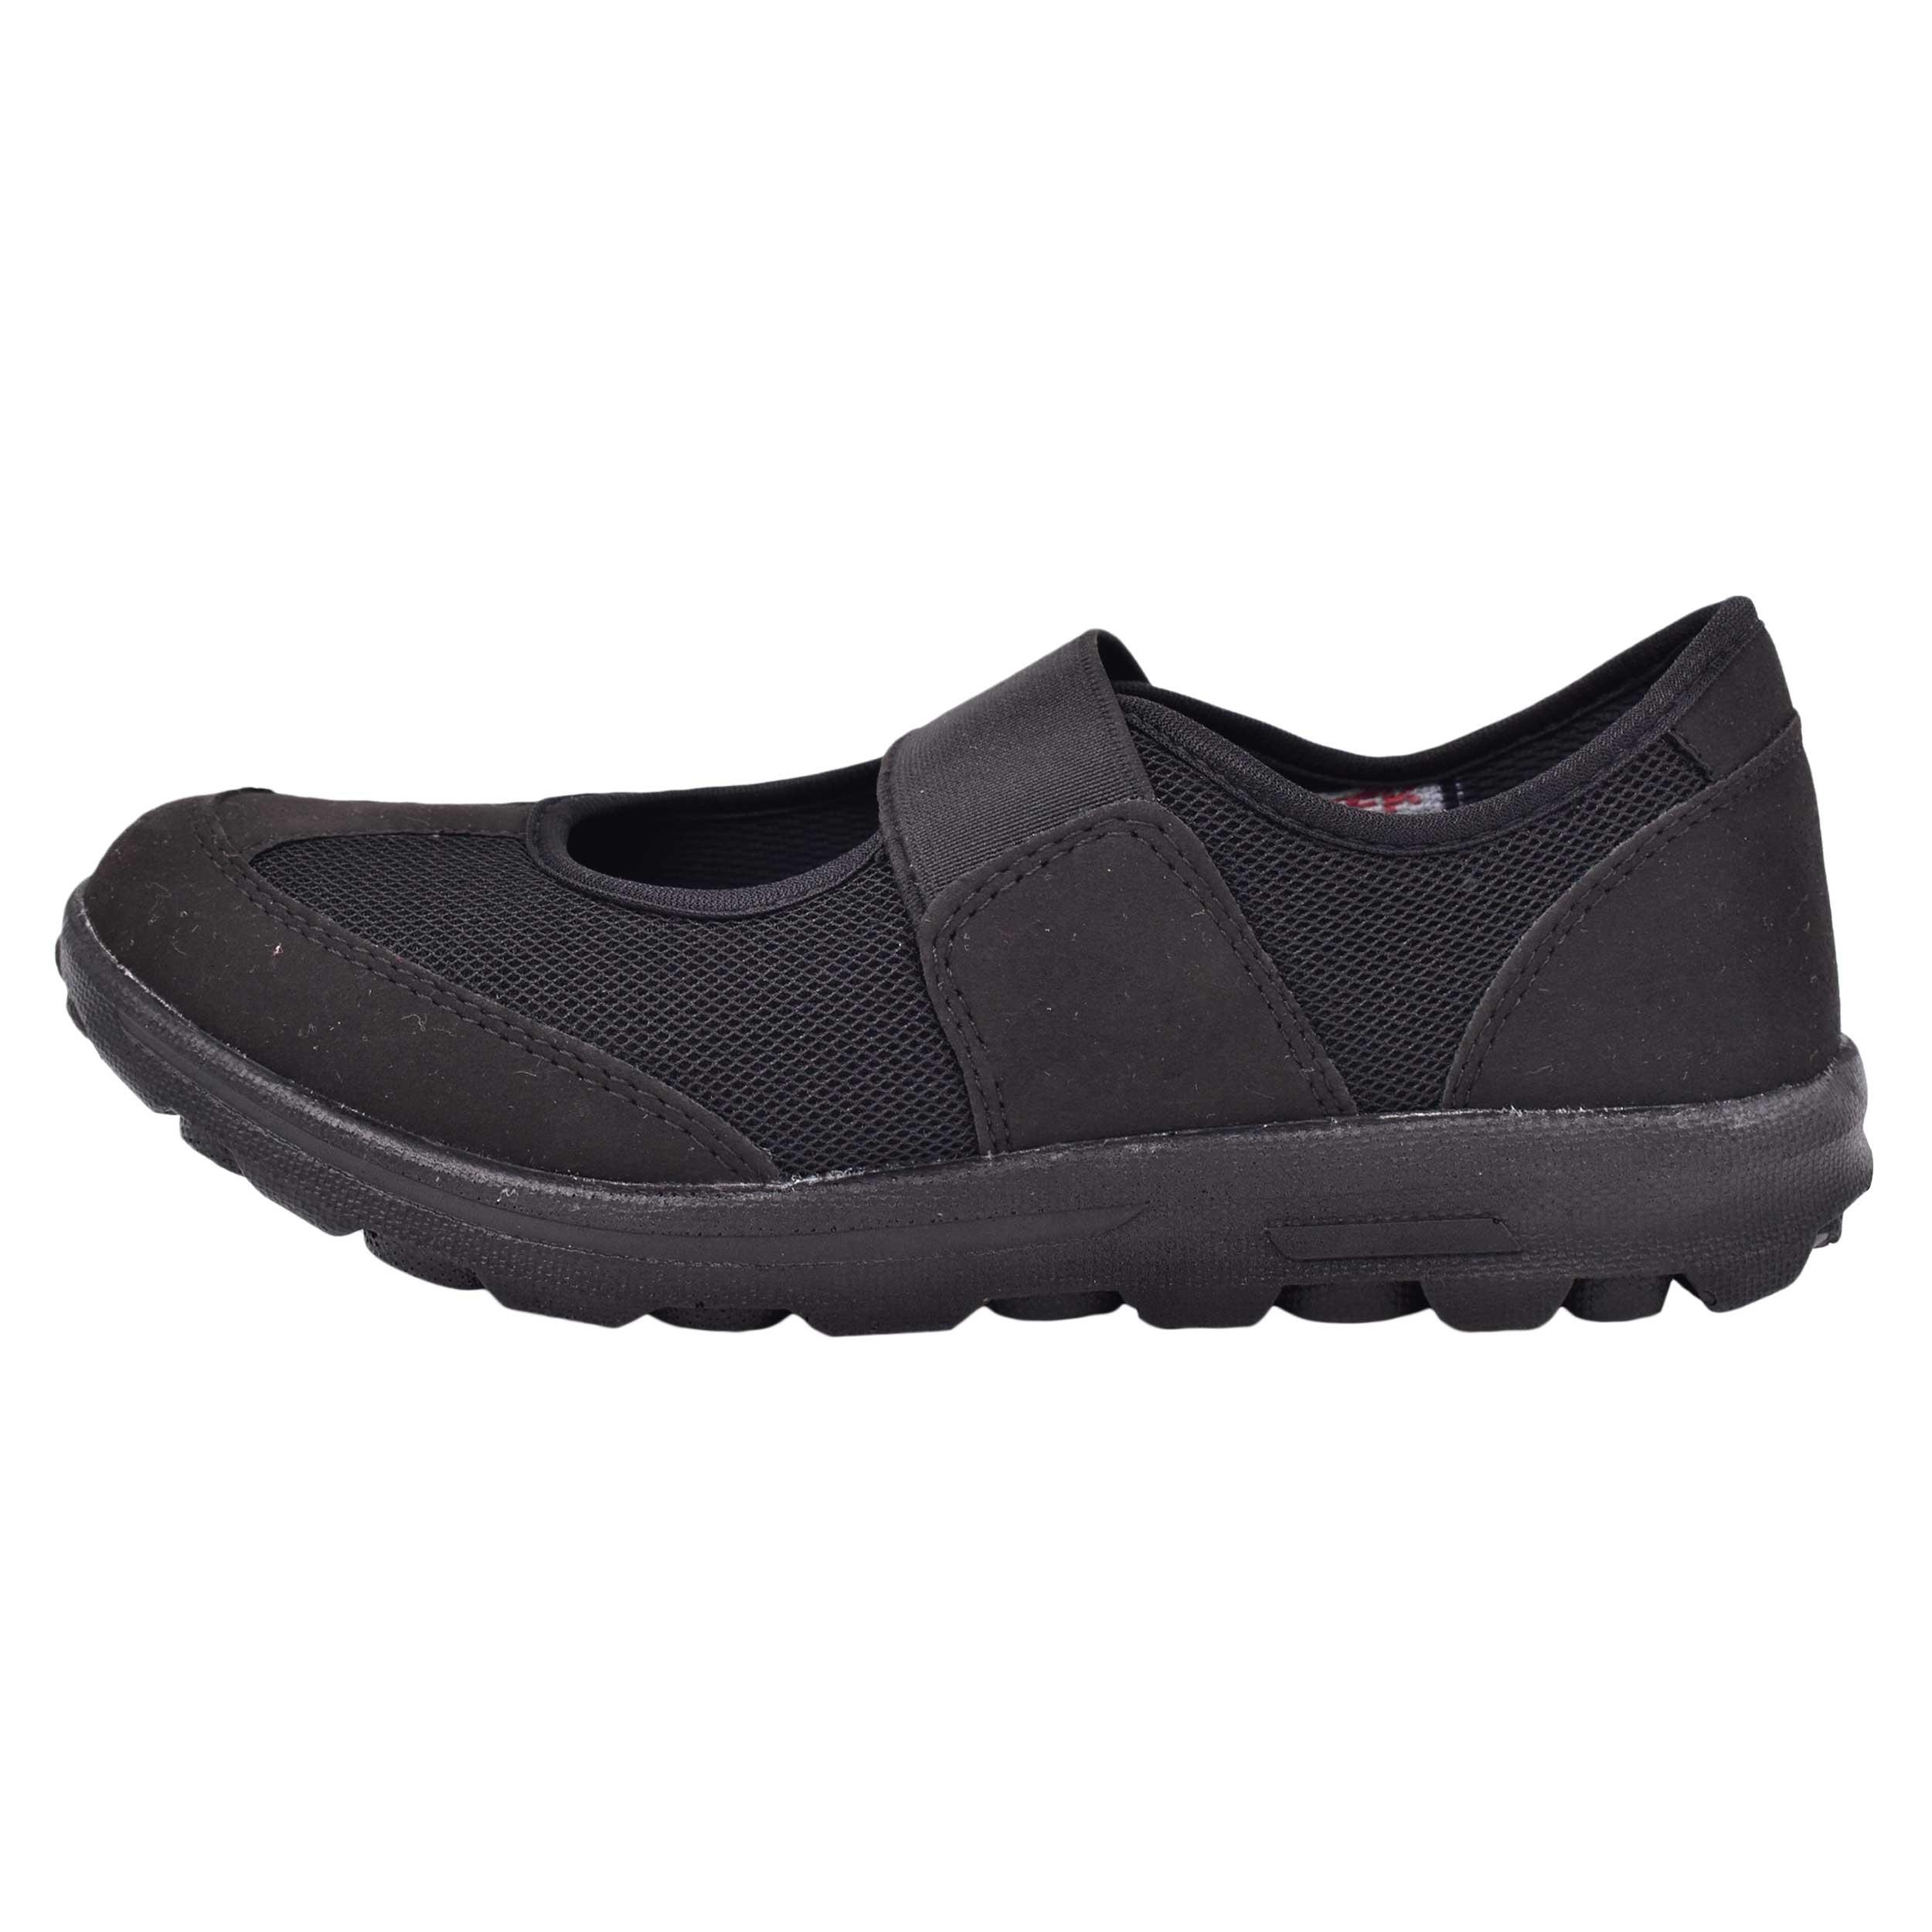 کفش روزمره زنانه آیتک کد 991-2